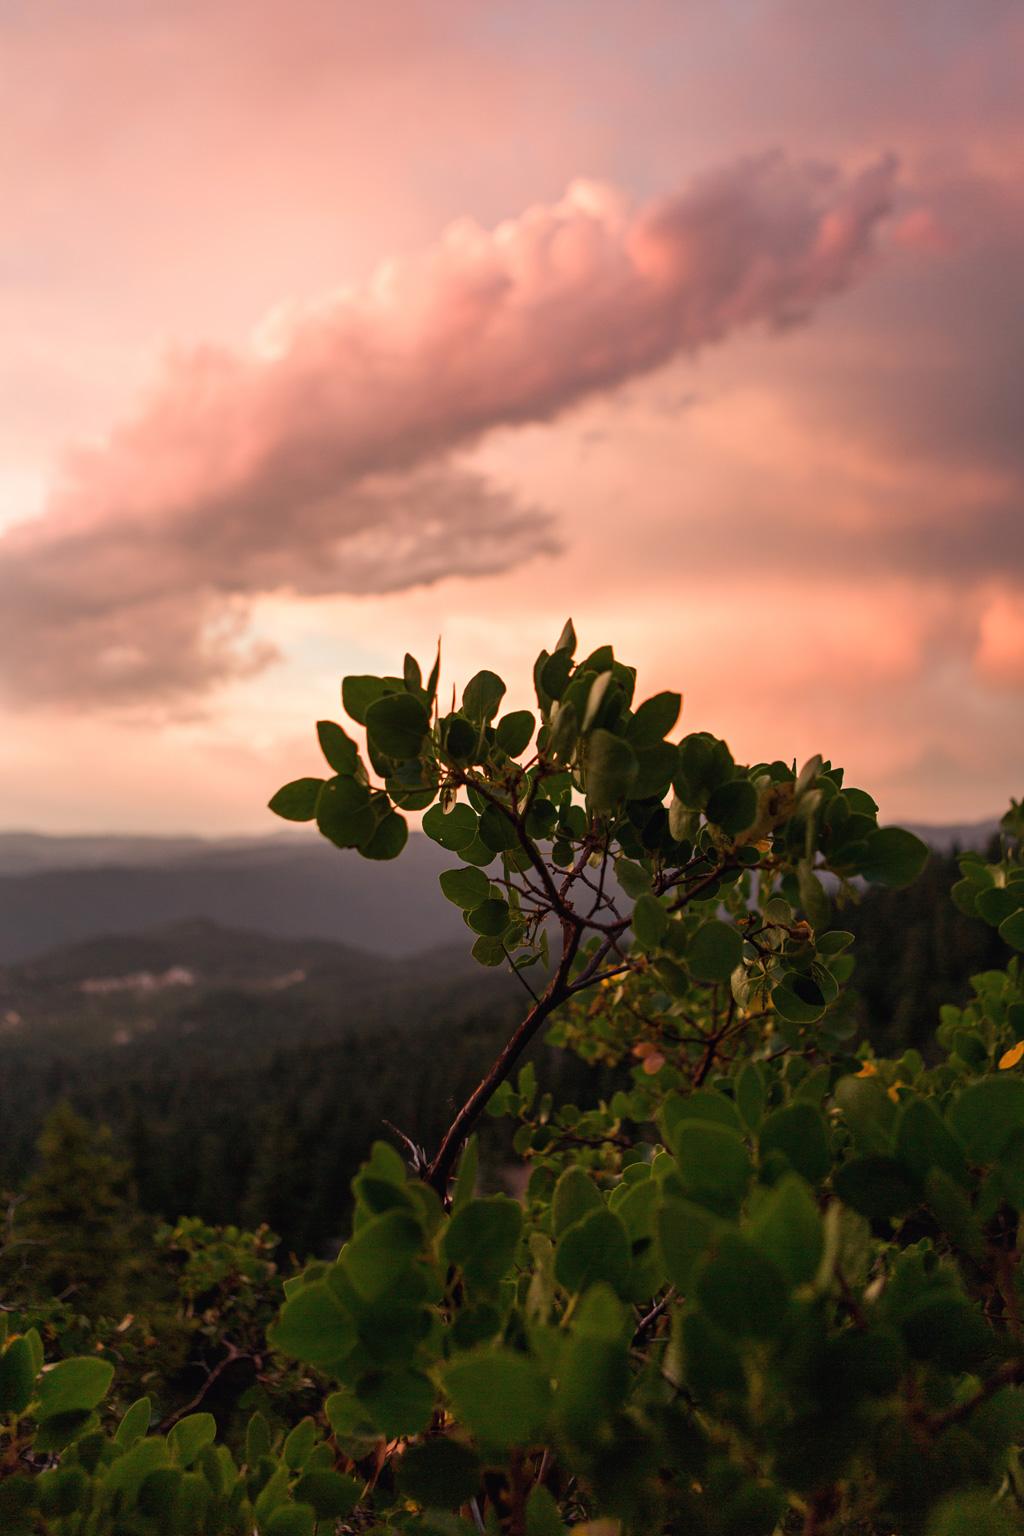 CindyGiovagnoli_California_Nevada_photographer_NevadaCity_PerseidMeteorShower_StampedeReservoir_truck_camping_VirginiaCity_MarkTwain_sunset-014.jpg